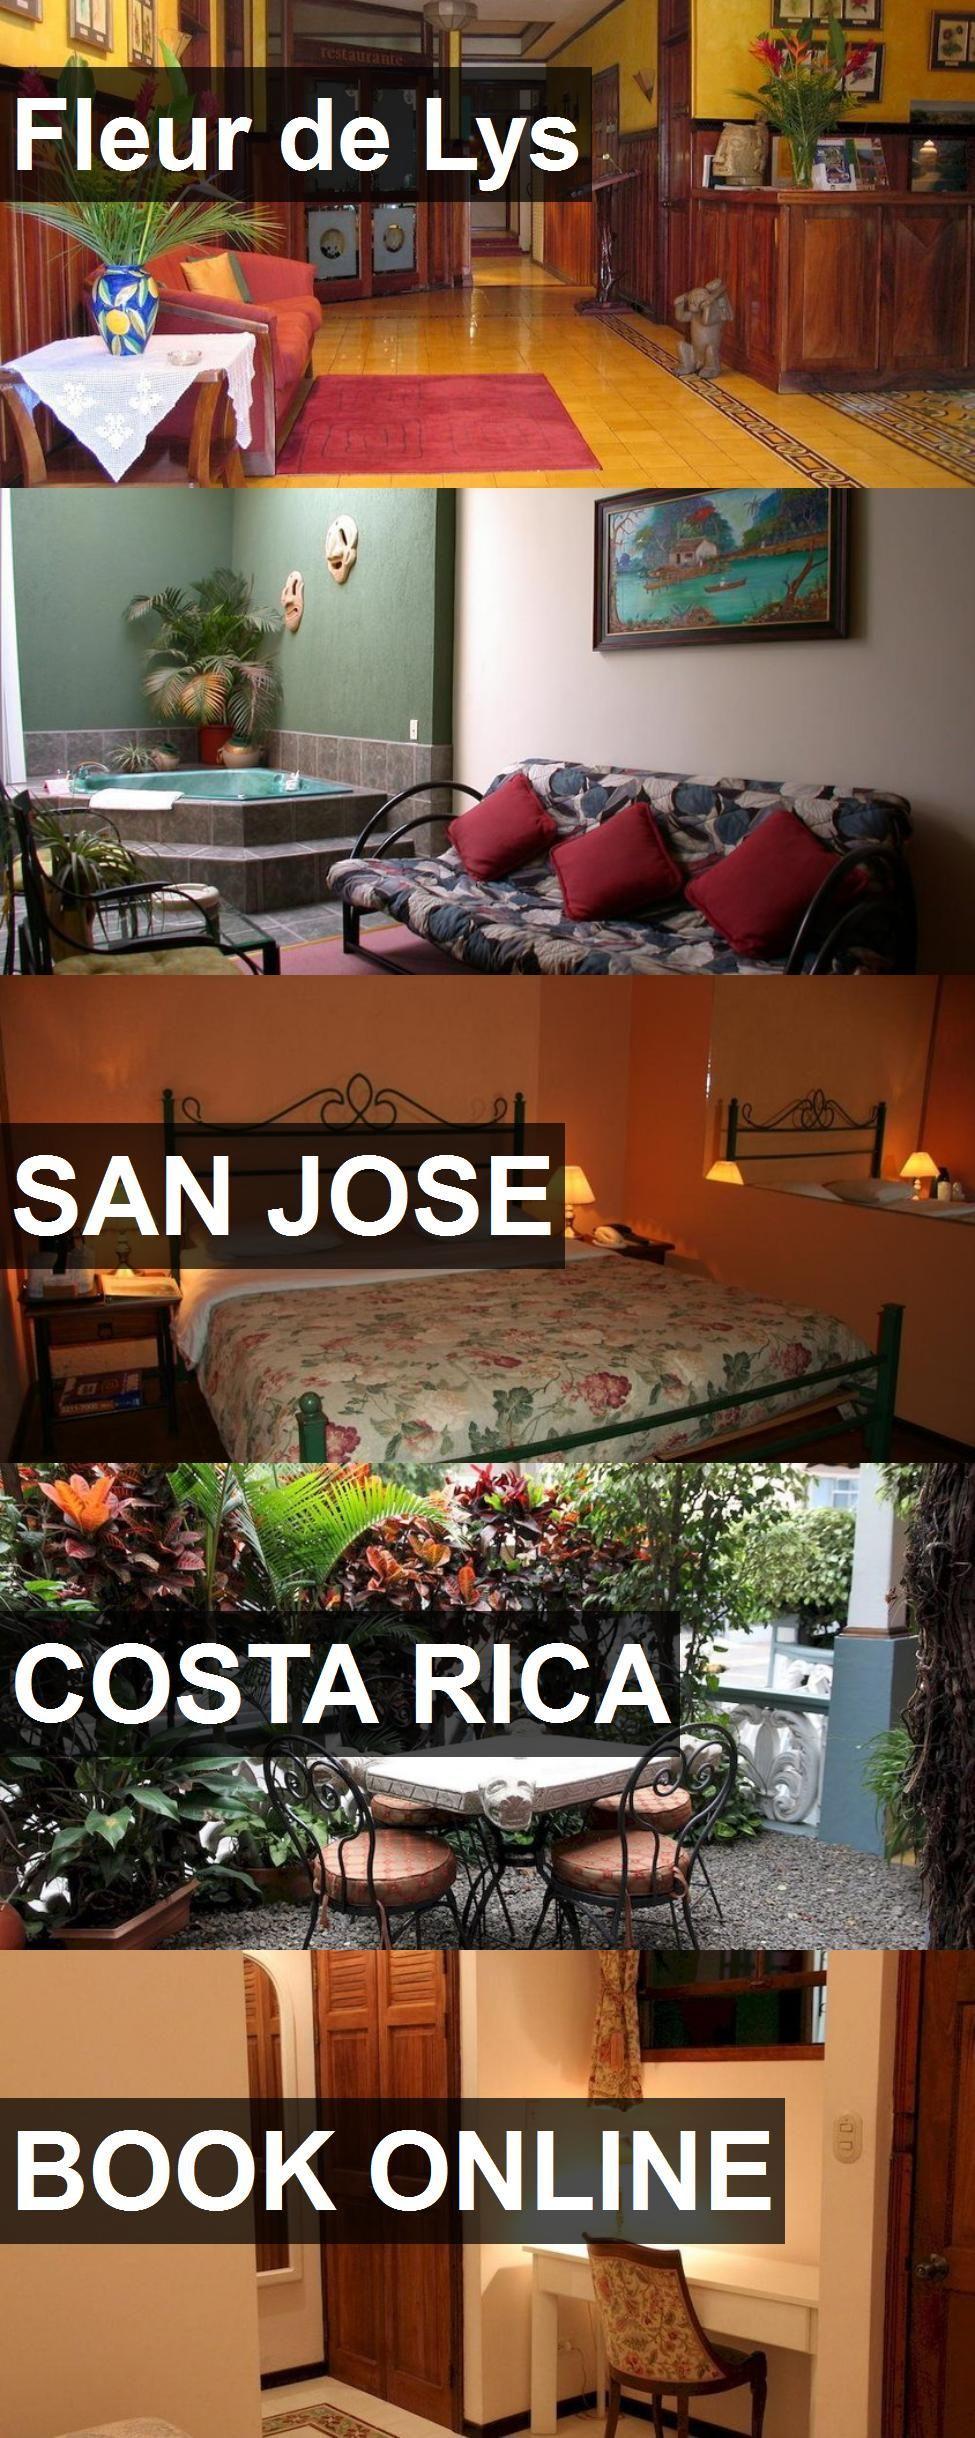 Hotel Fleur de Lys in San Jose, Costa Rica. For more information ...